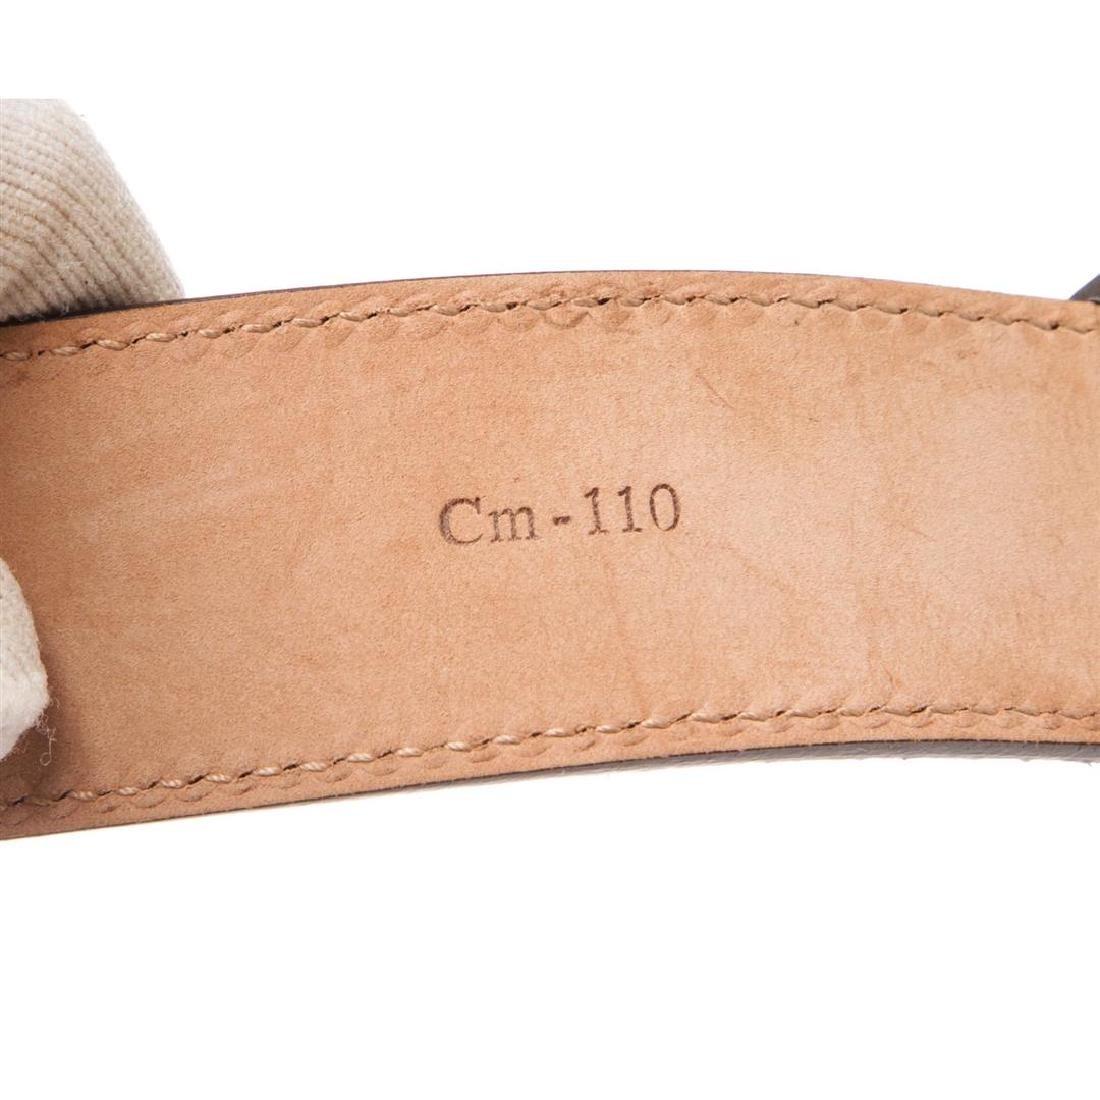 Salvatore Ferragamo Gancini Brown Leather Belt - 9